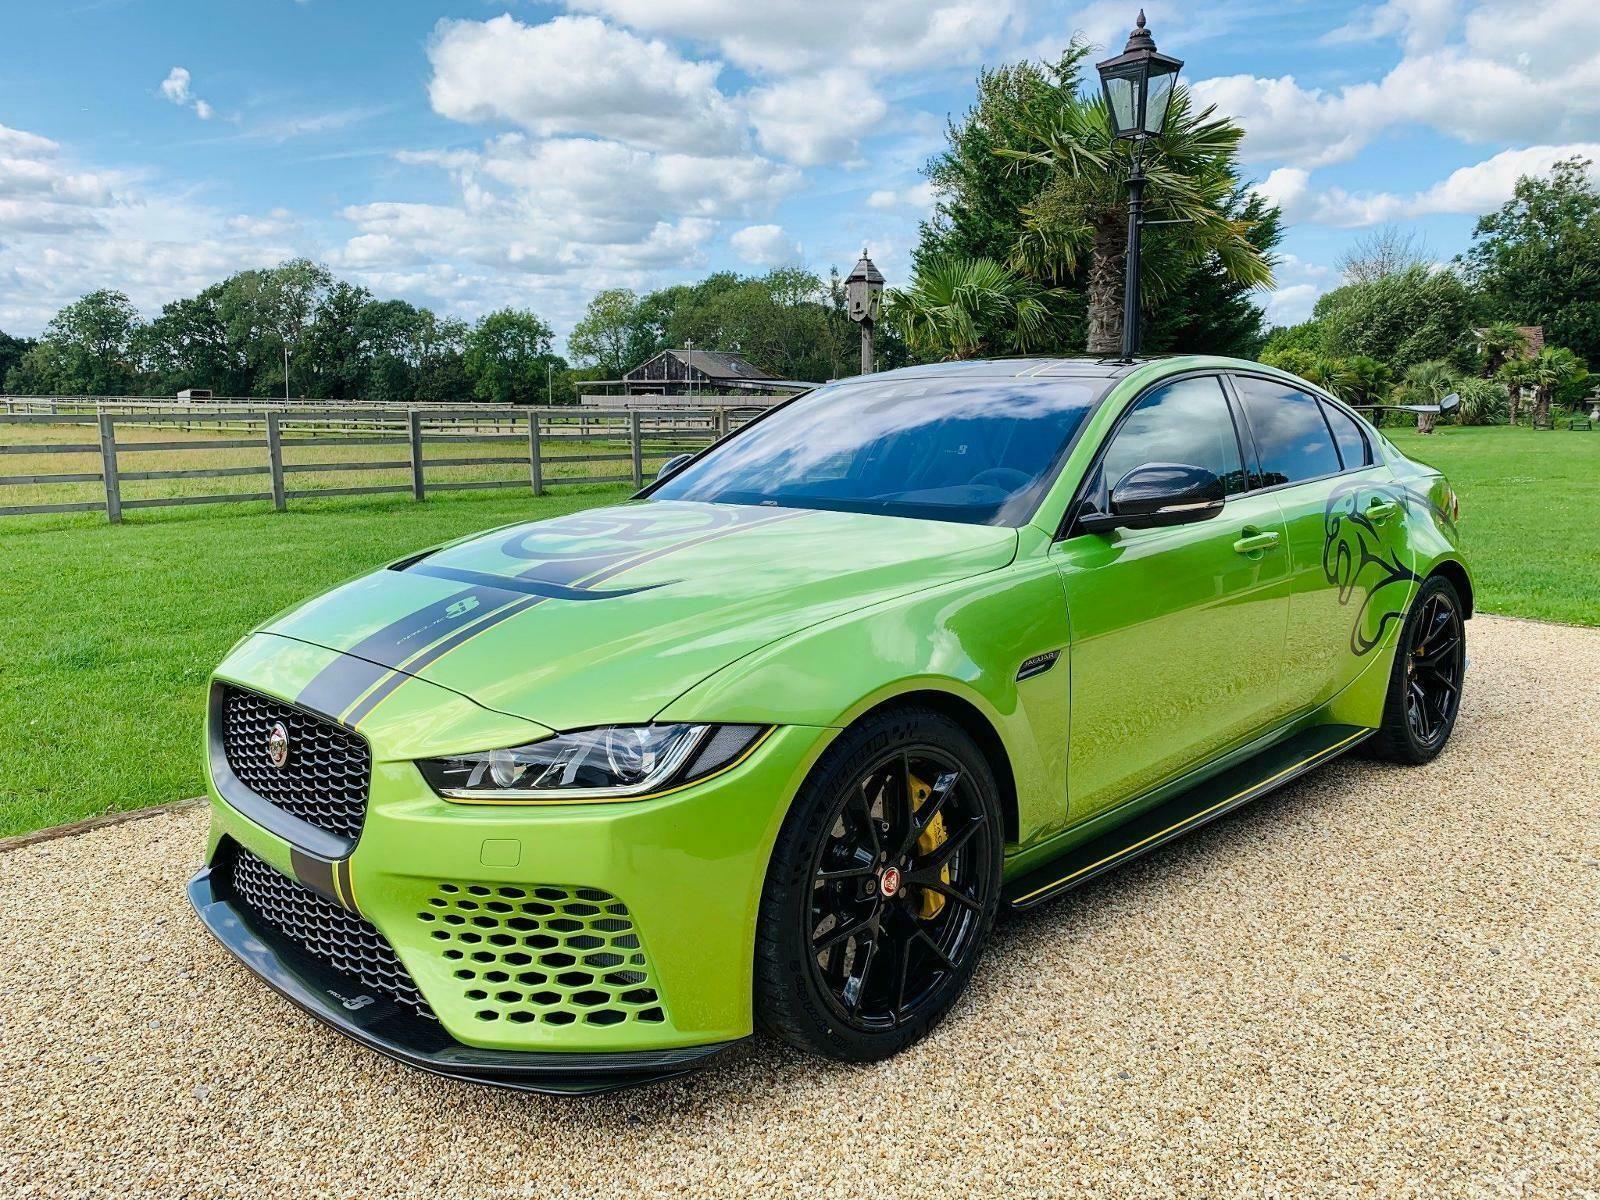 2019 Jaguar Xe 5 0 V8 Project 8 Auto Awd 4dr Saloon Petrol Automatic Ebay Jaguar Xe Cars For Sale Hybrid Car